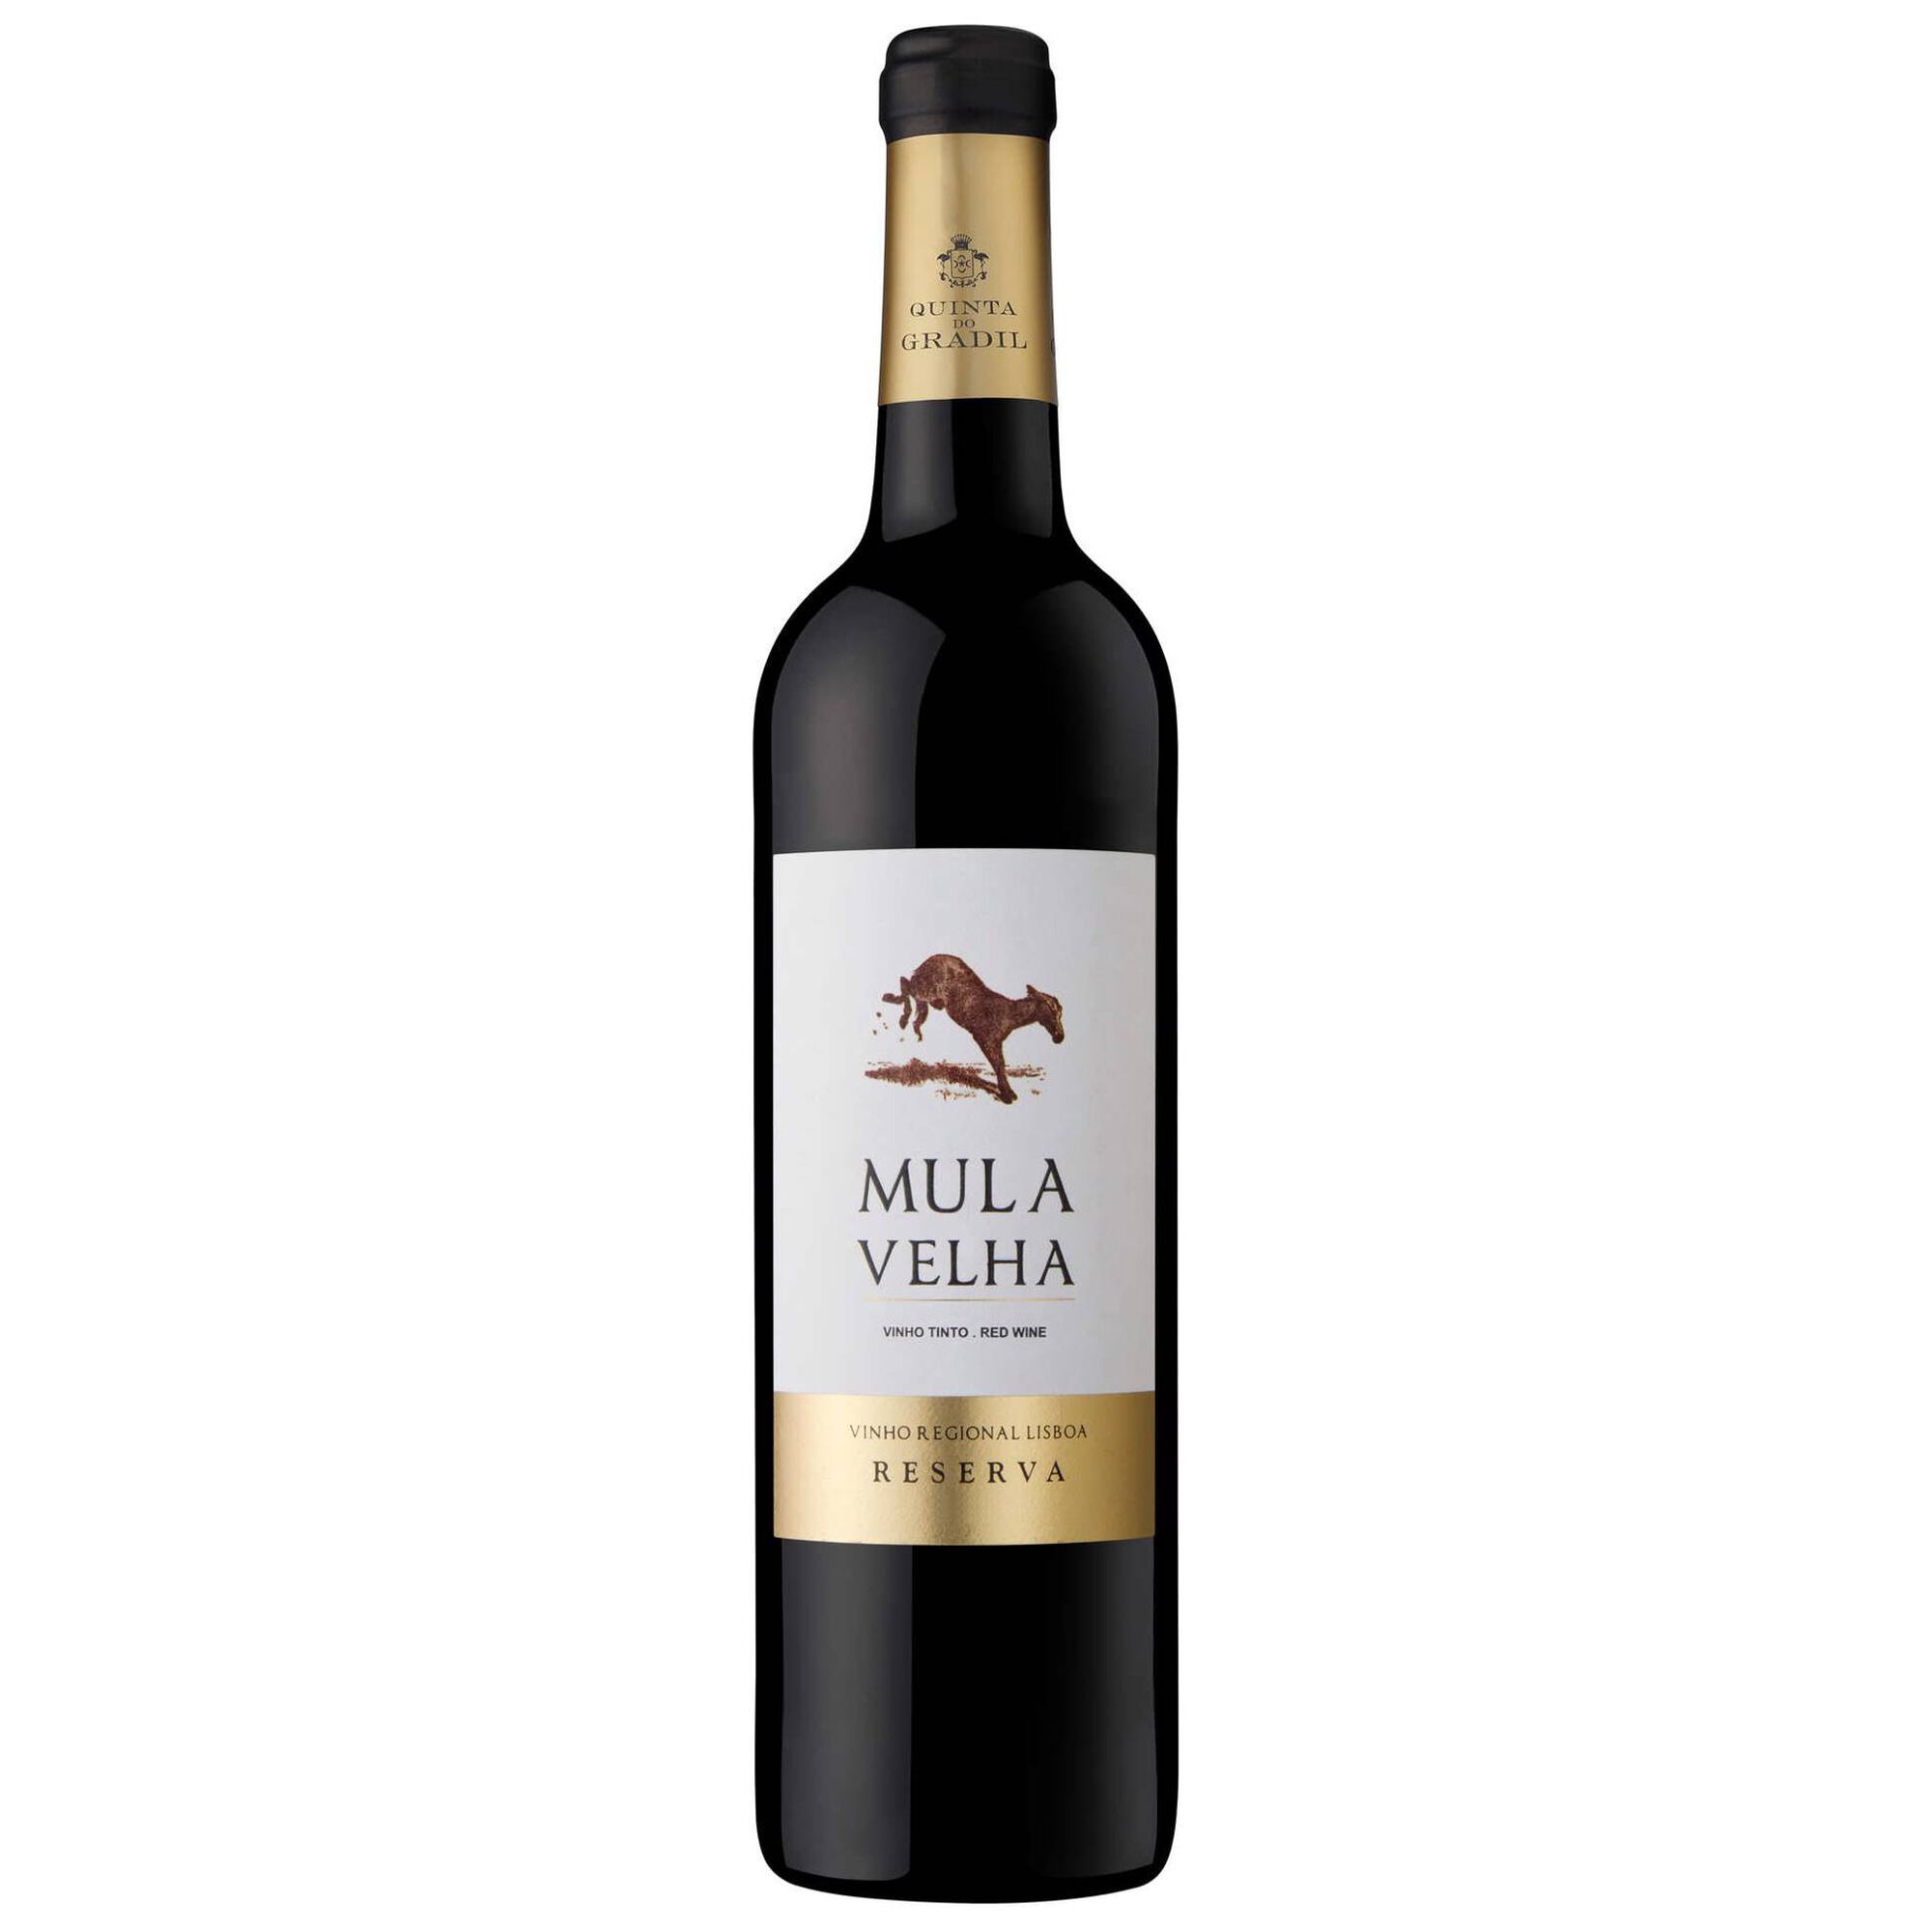 Mula Velha Reserva Regional Lisboa Vinho Tinto